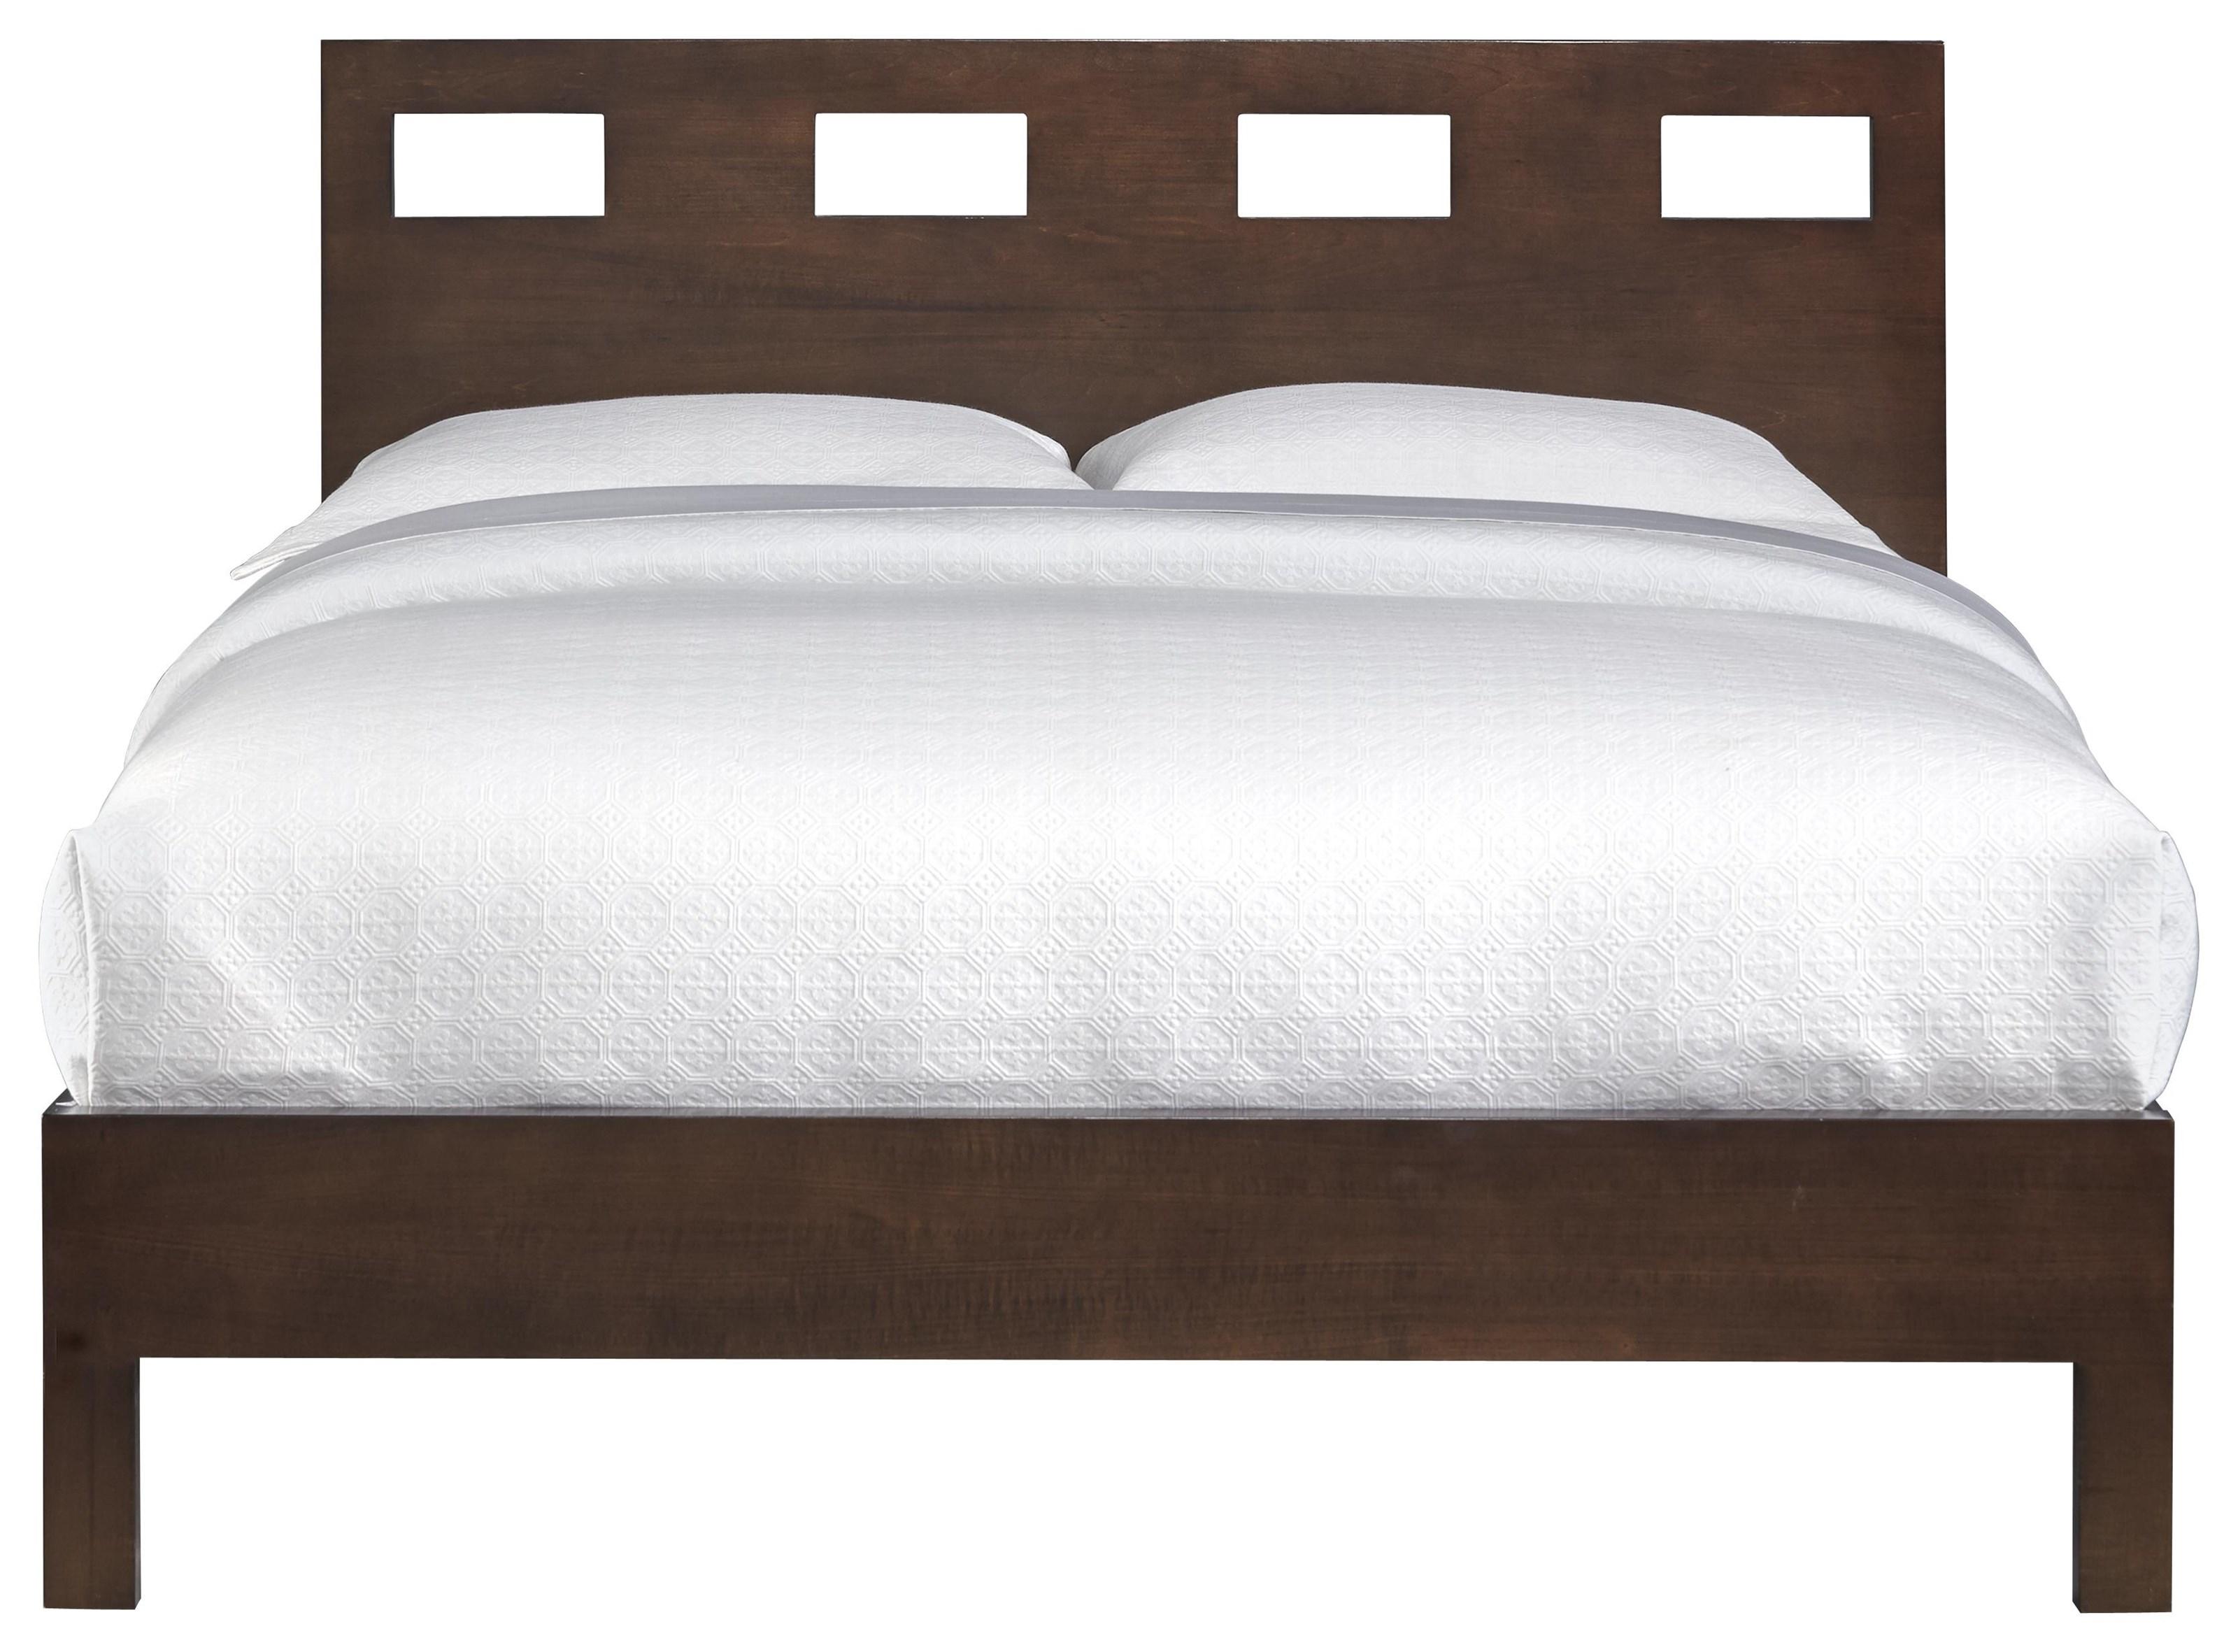 Modus International Riva Queen Bed - Item Number: Rv 26 F5 Riva